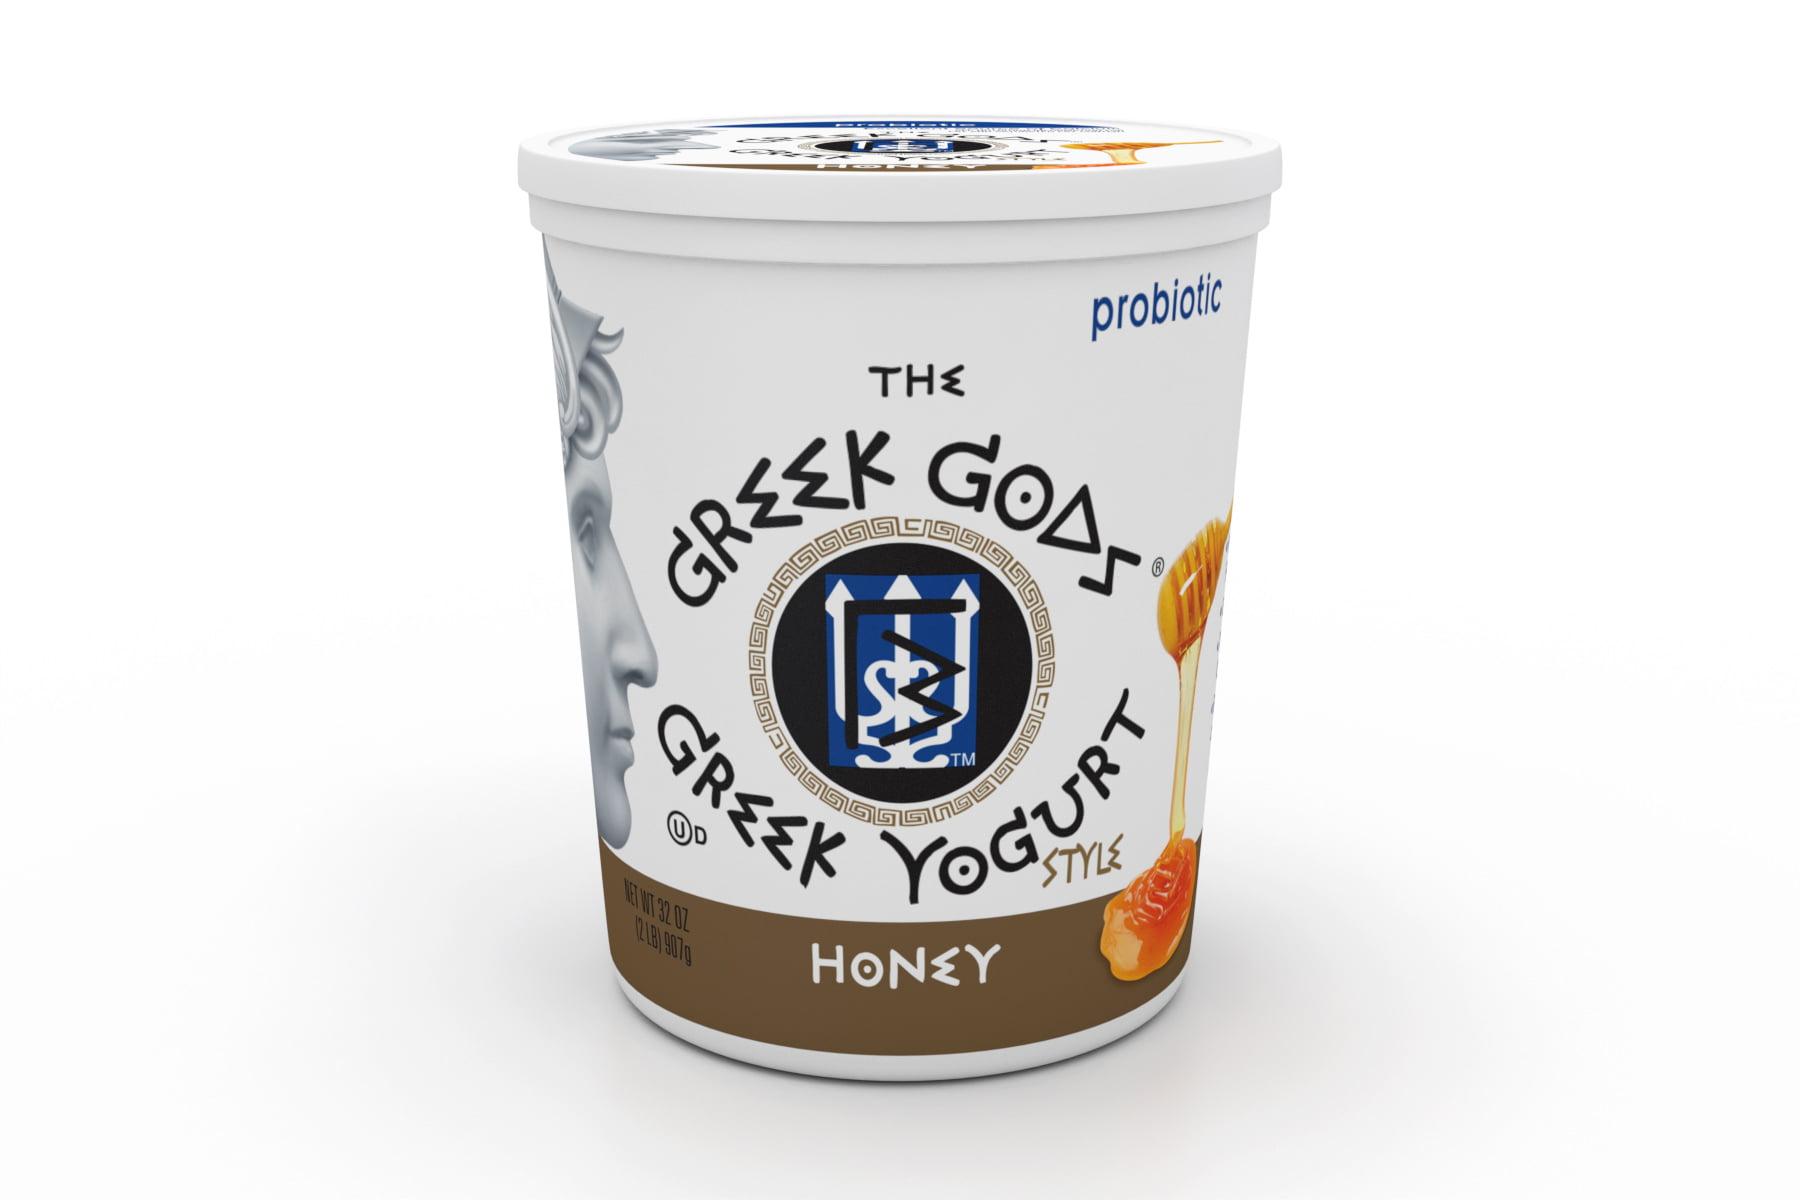 Greek Gods Honey Greek Yogurt, 32 oz  Tub